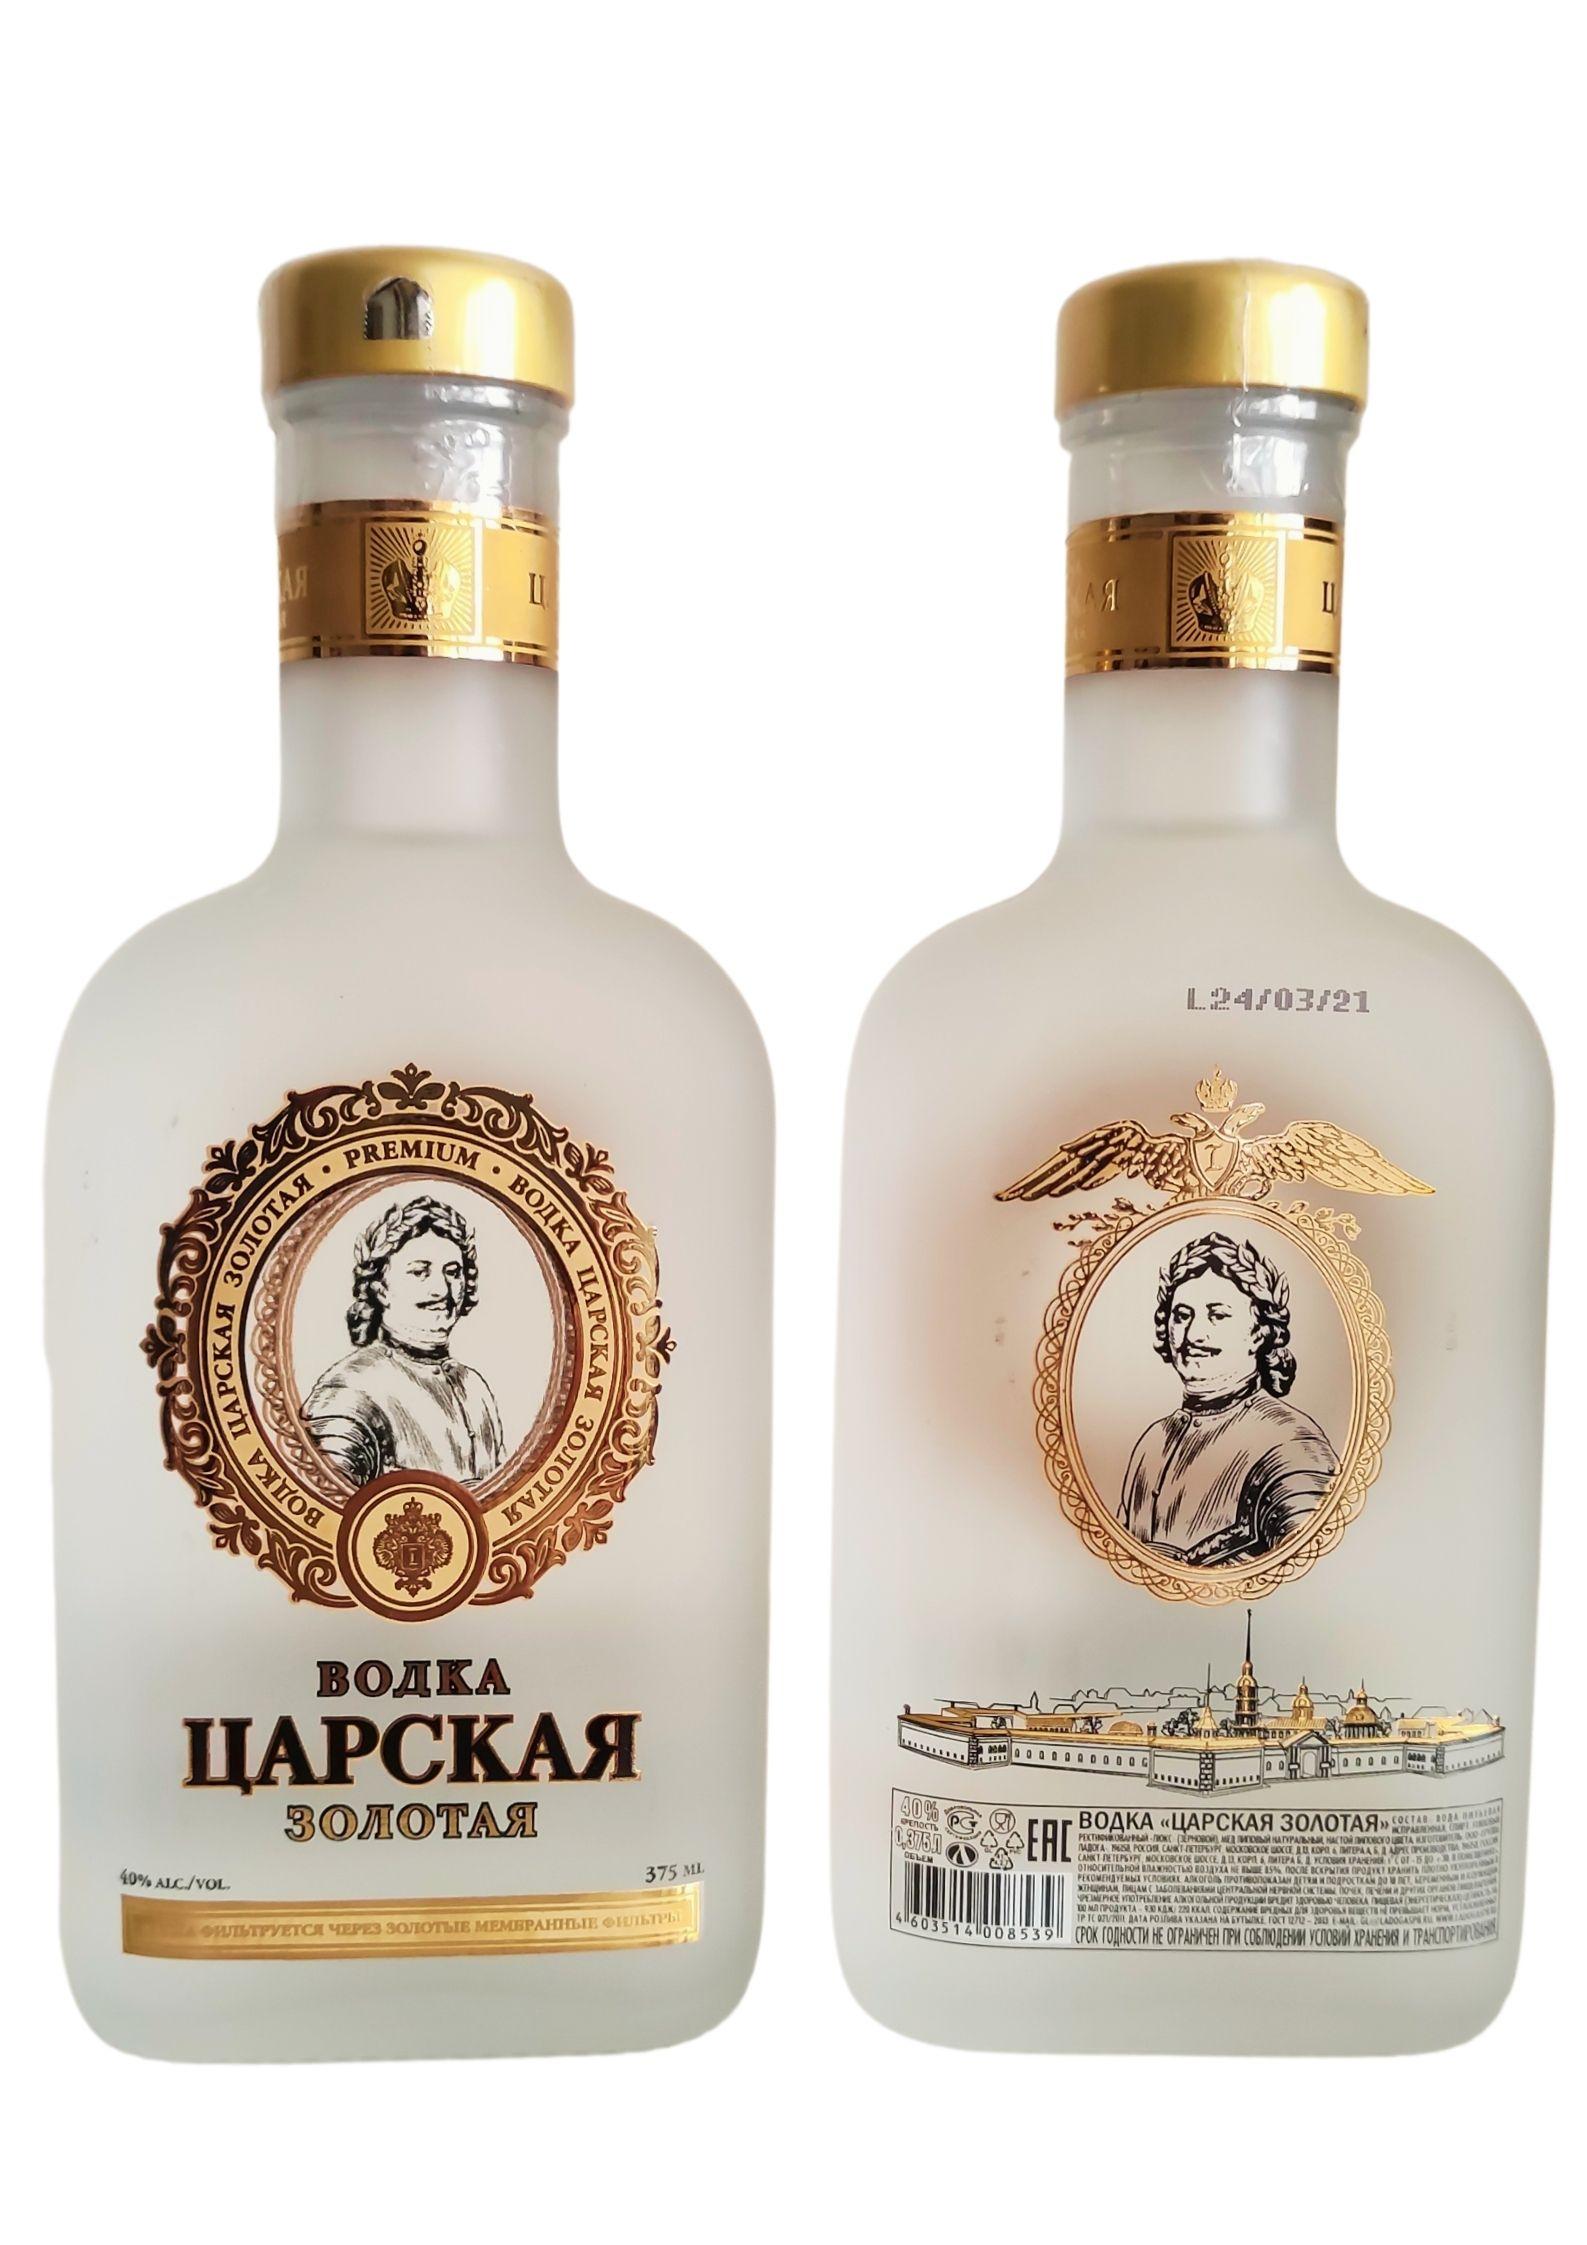 Vodka Russe Tsarskaya Gold Flasque x 2